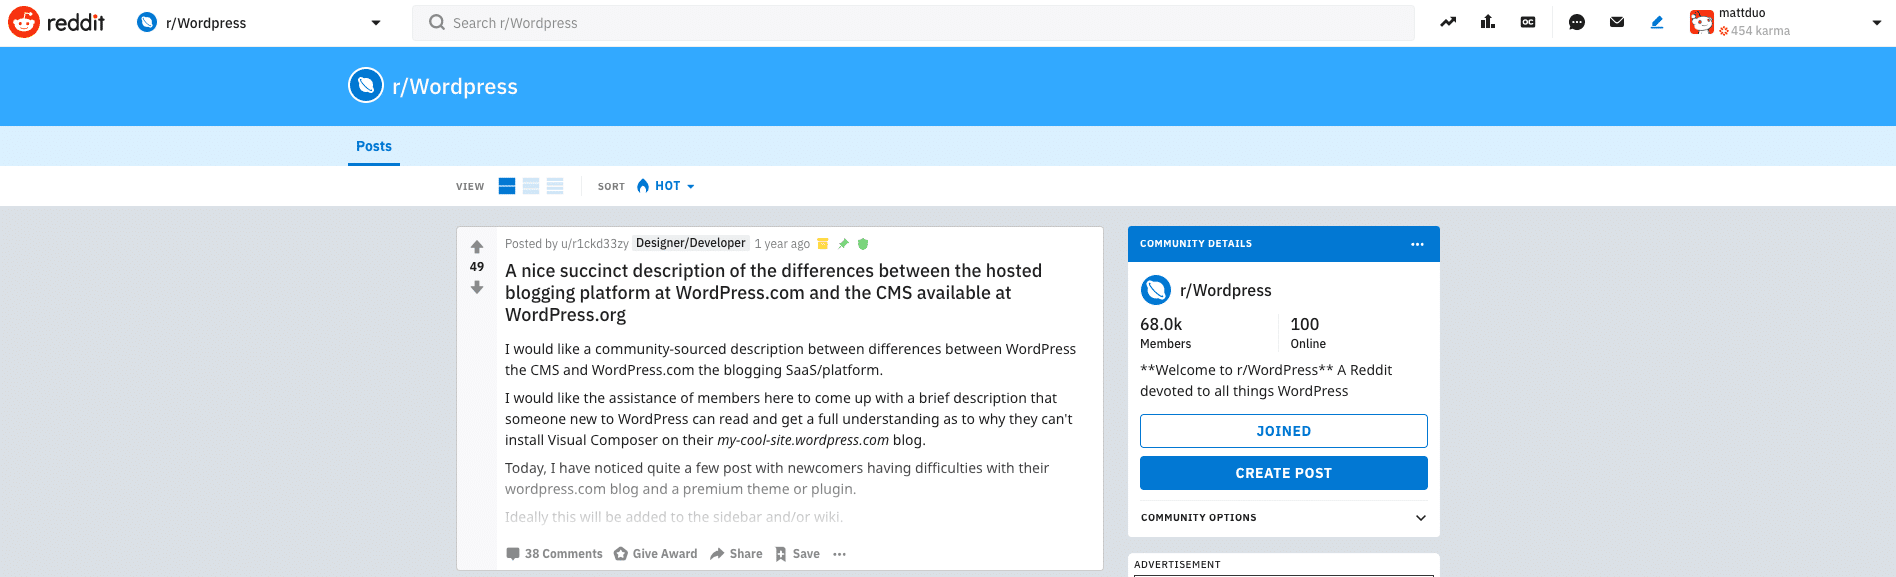 WordPress op Reddit